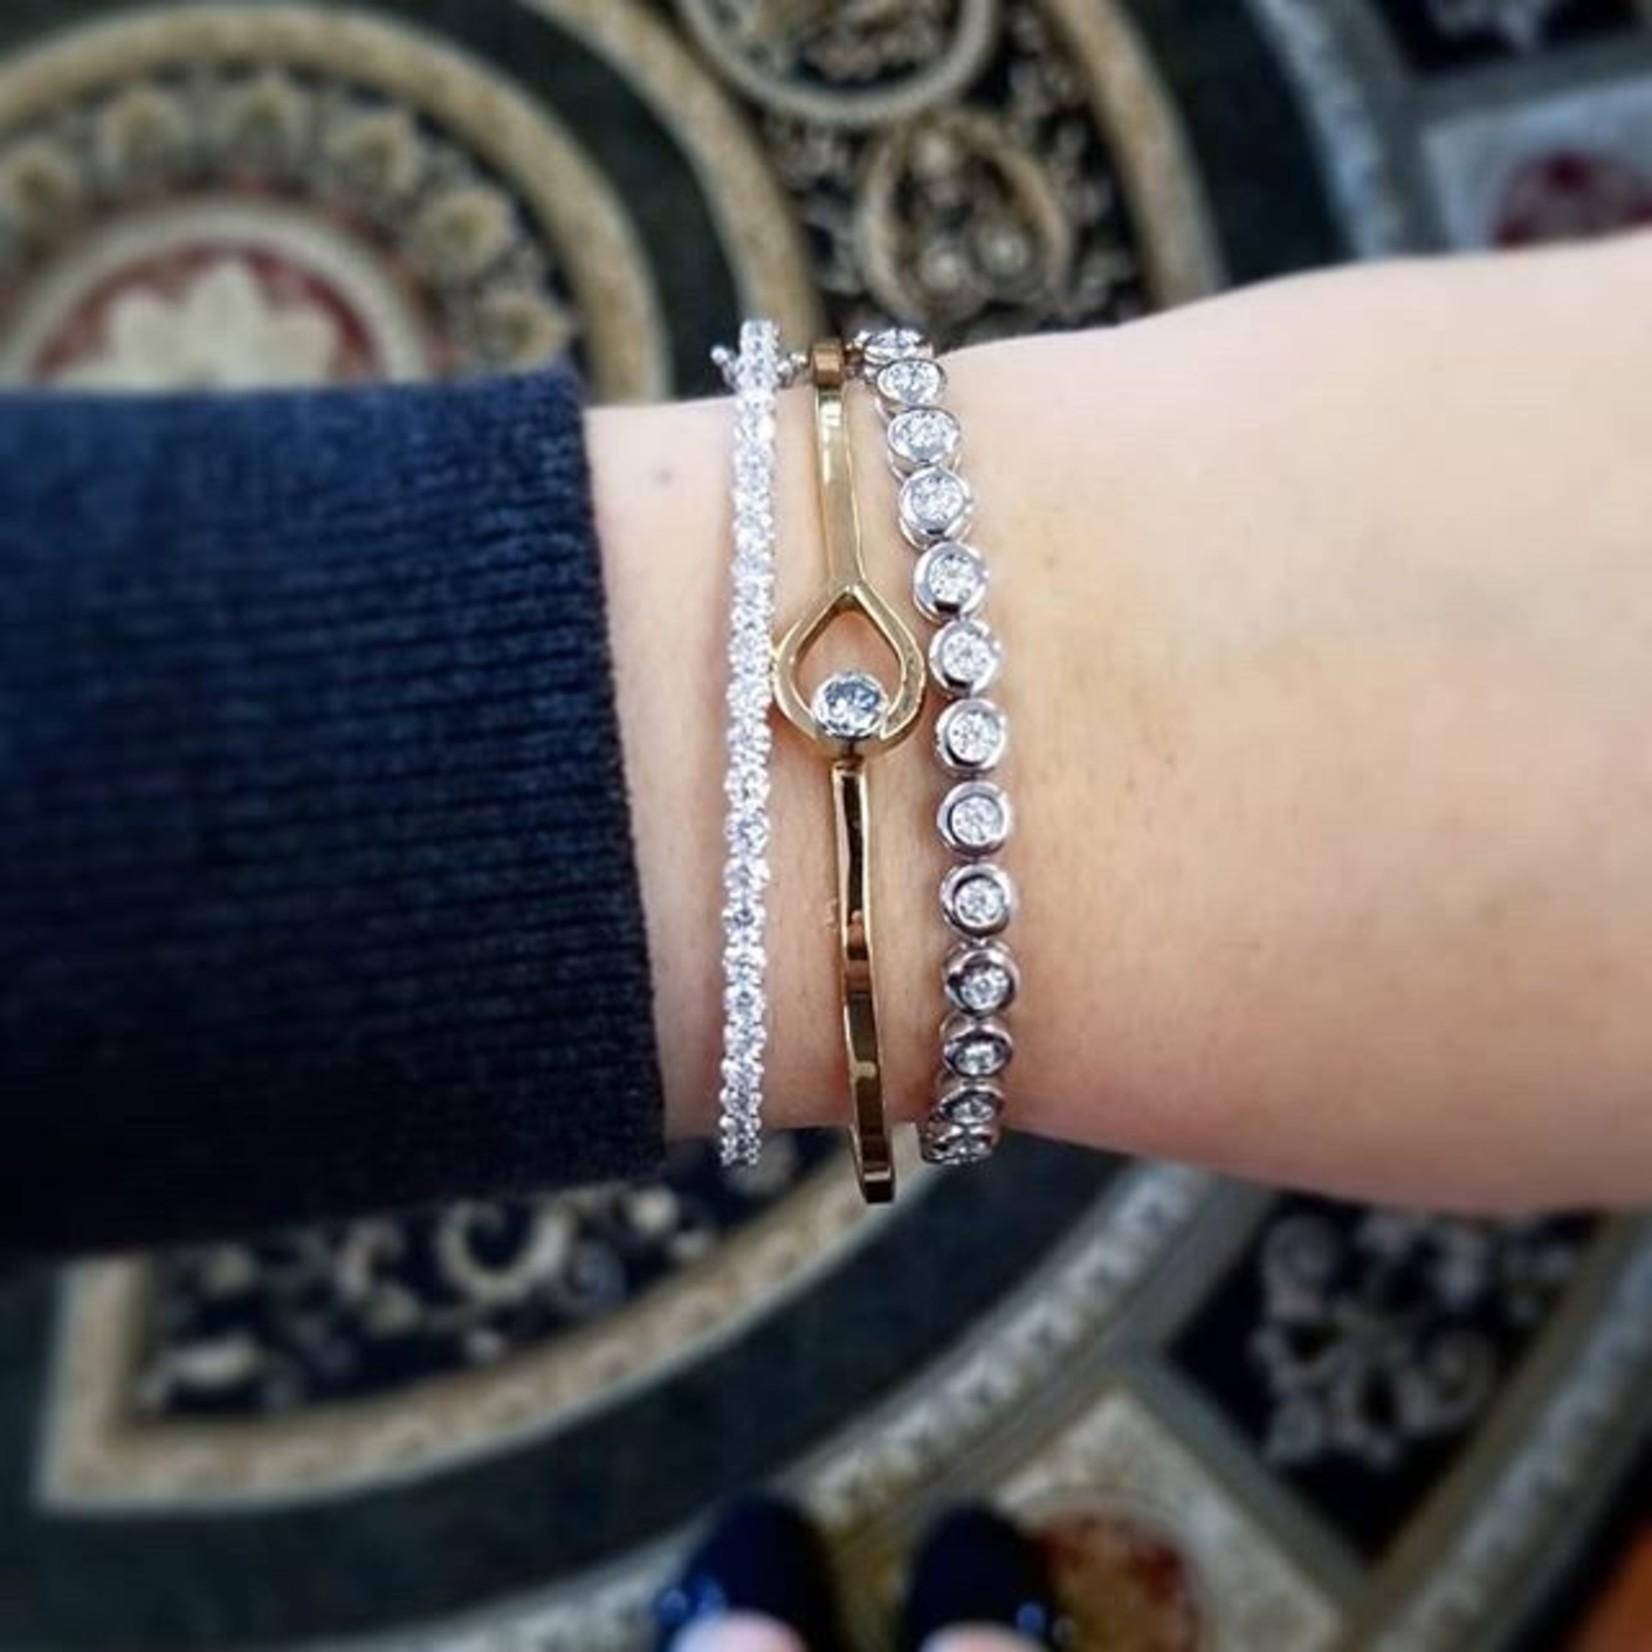 Classic Diamond Bangle Bracelet 2.61 carat total weight